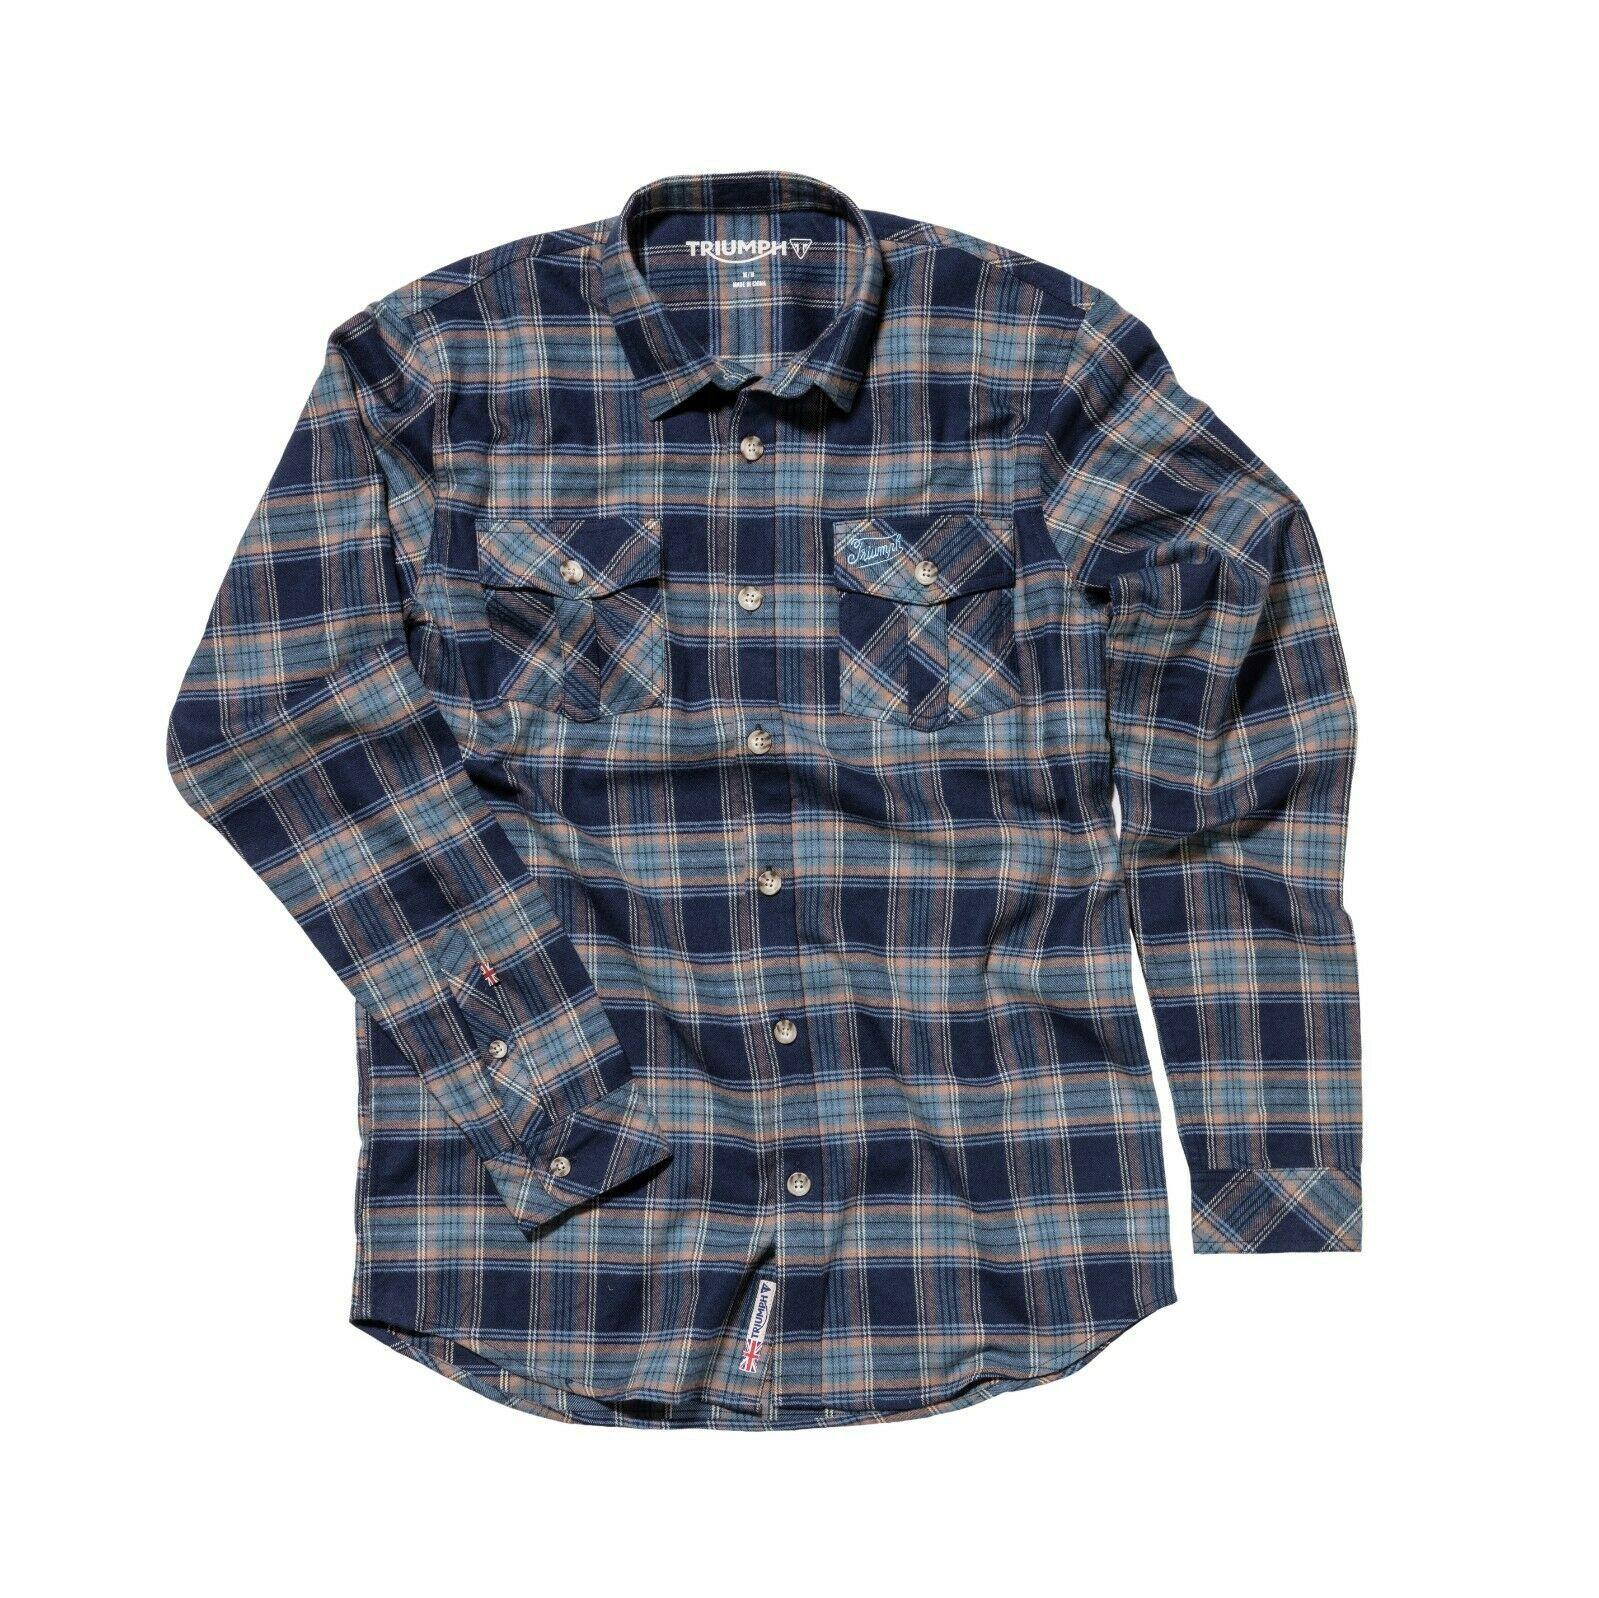 TRIUMPH Edward Shirt